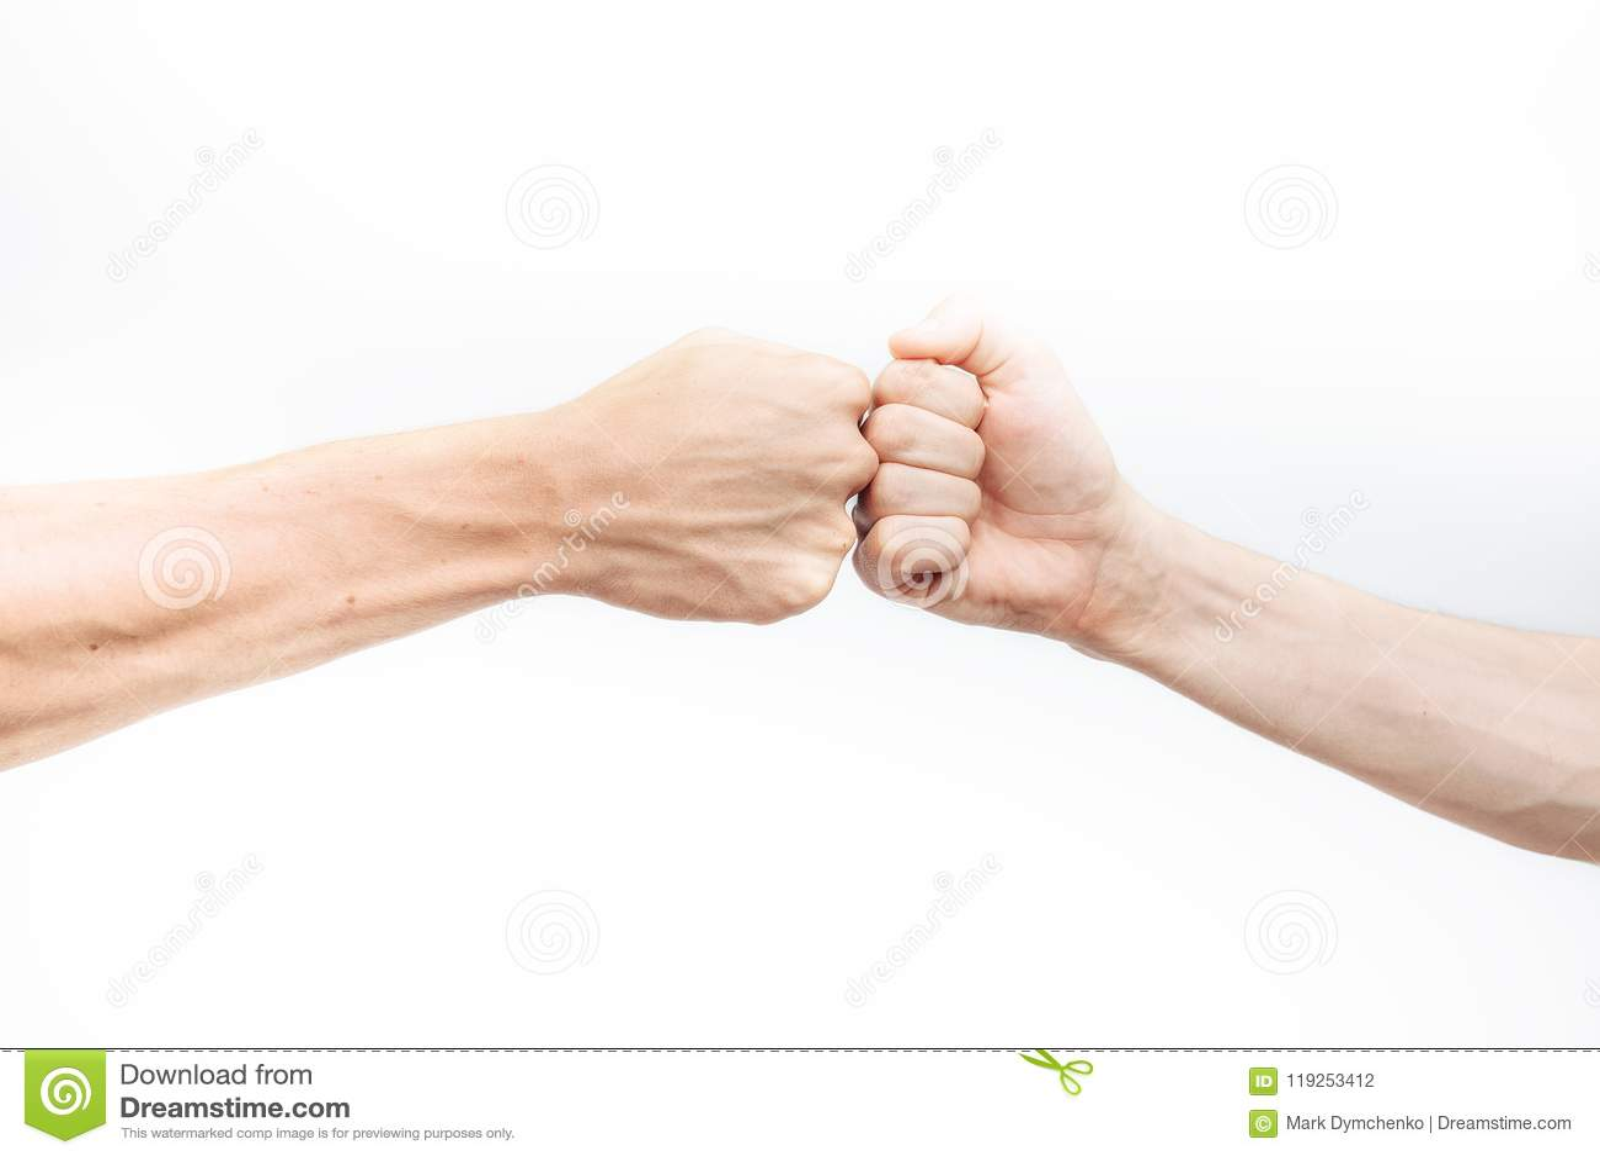 a fist Makes